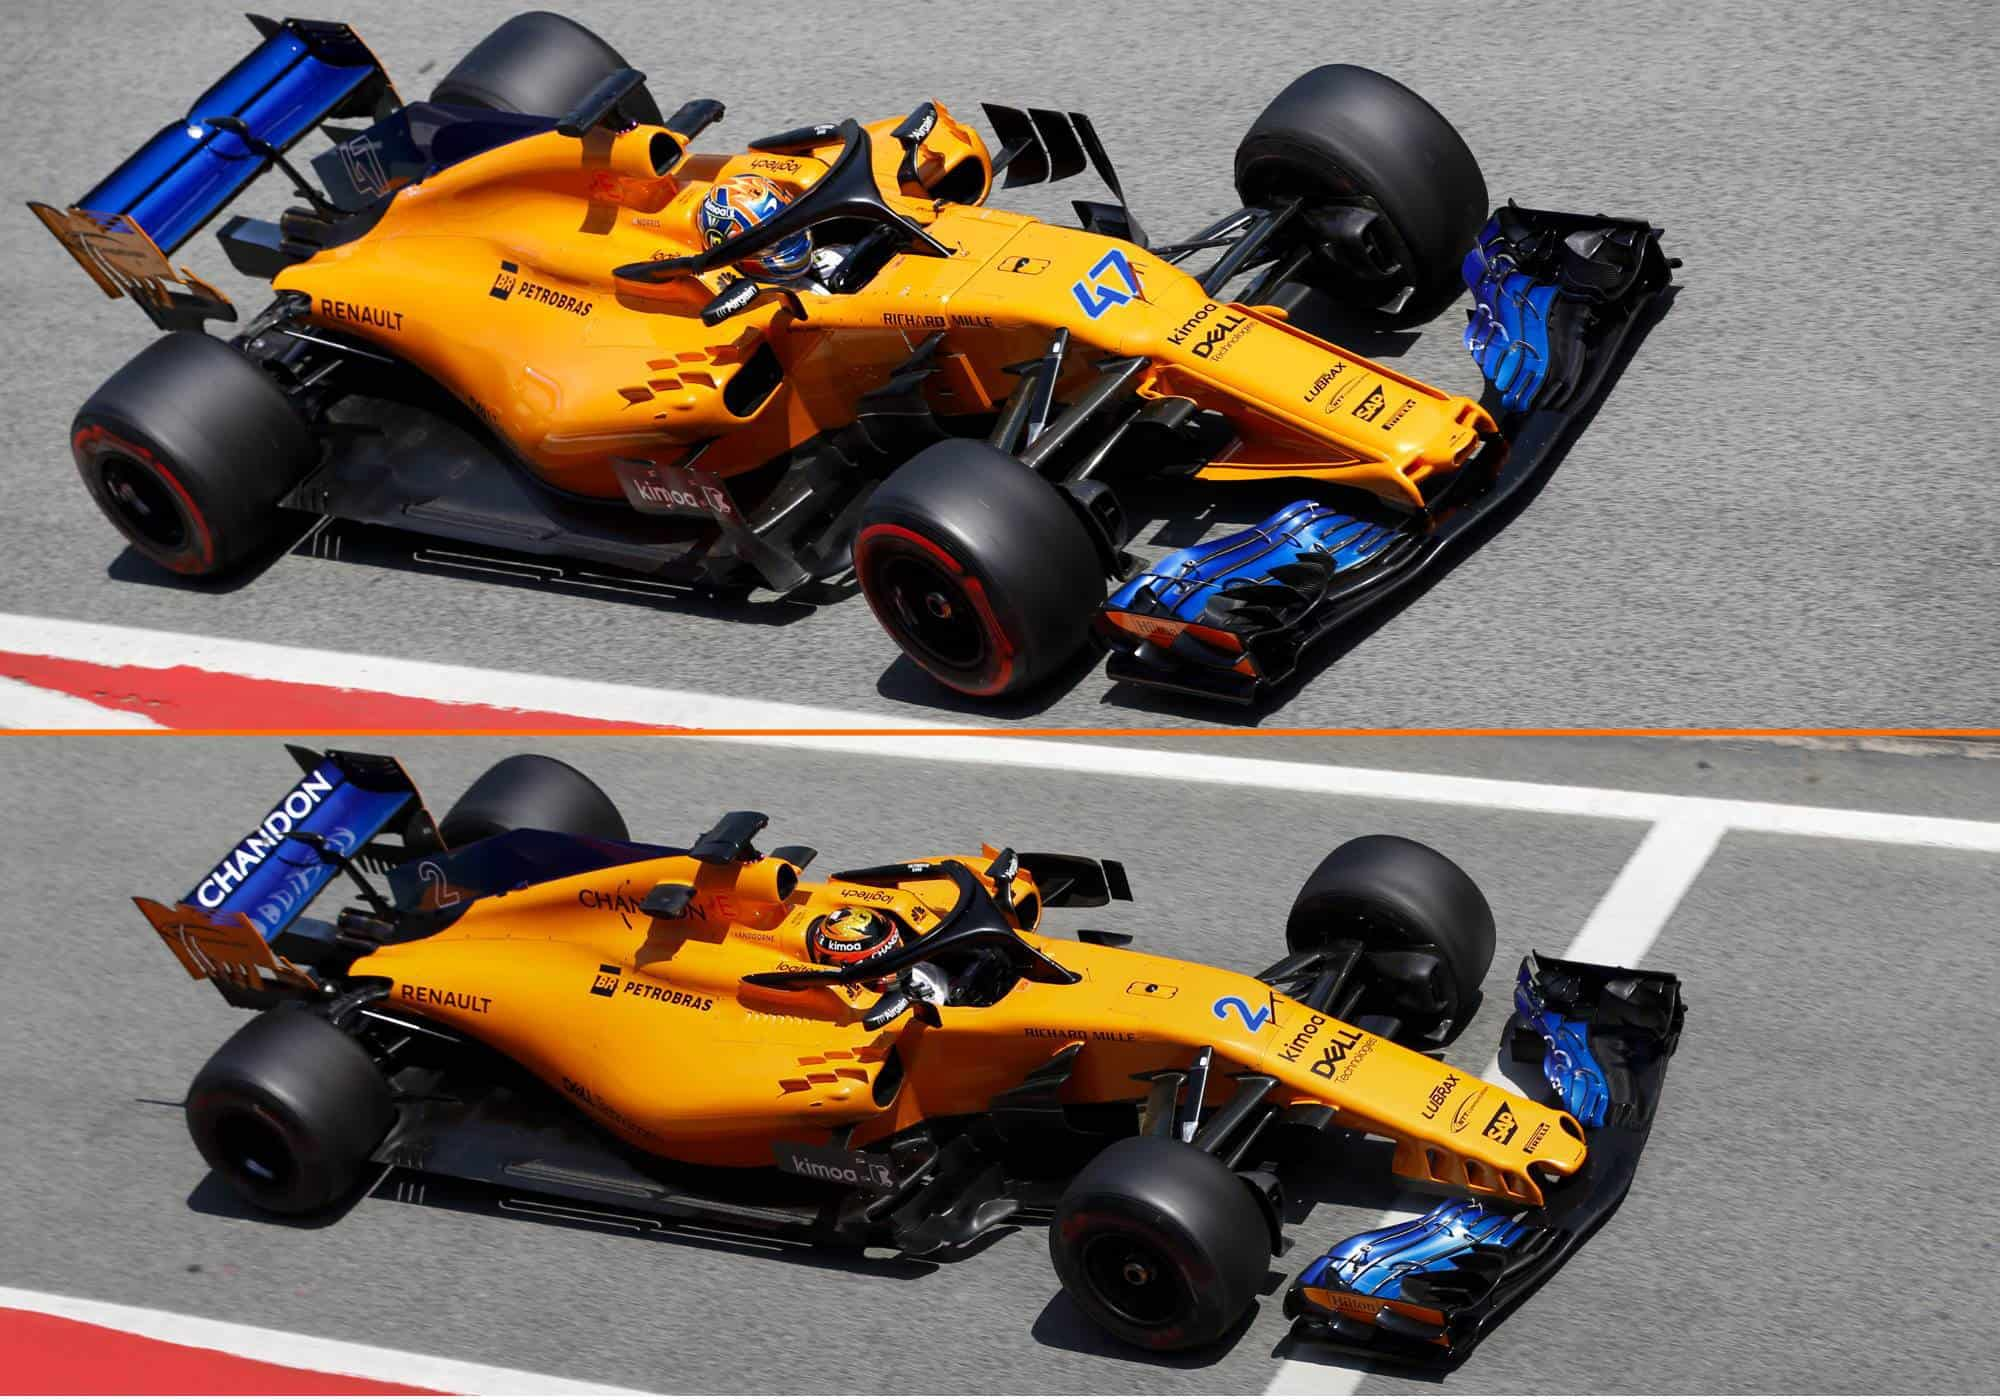 McLaren MCL33 F1 2018 Barcelona Spanish GP comparison aero package